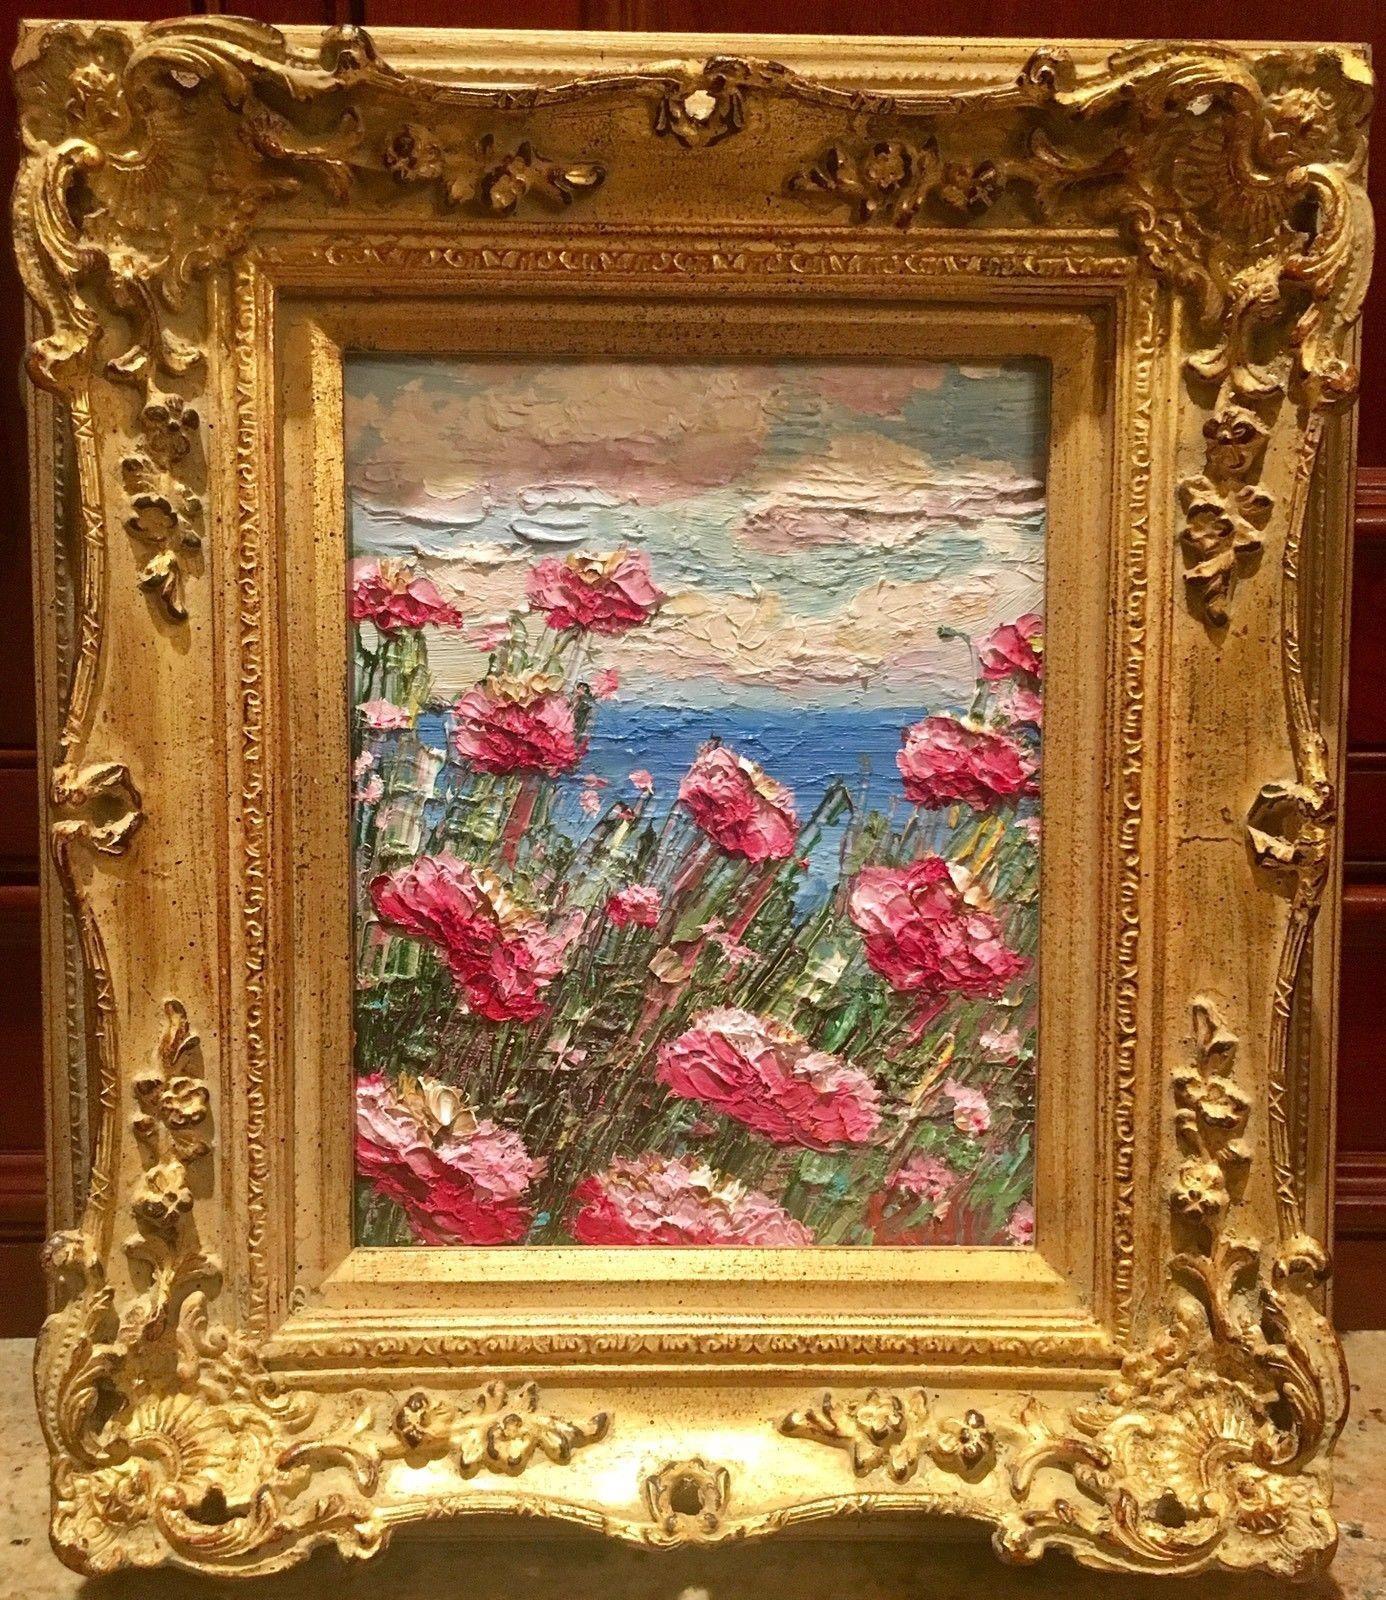 Abstract pink poppies seascape impasto 8x10 carved french frame abstract pink poppies seascape impasto 8x10 carved french frame original oil painting by artist sarah kadlic jeuxipadfo Image collections